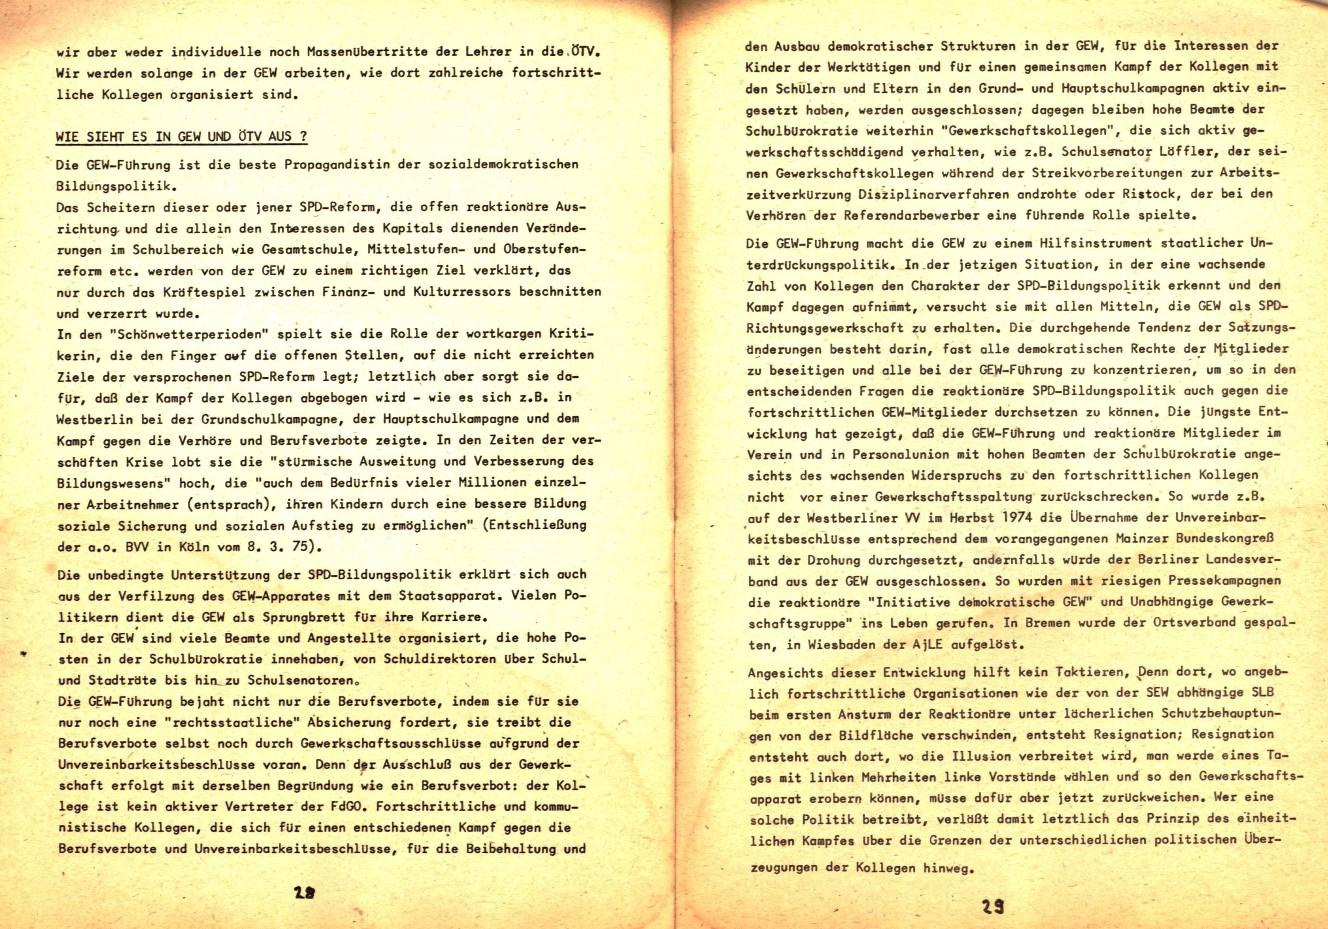 Berlin_BSLE_1975_Grundlagenpapier_16